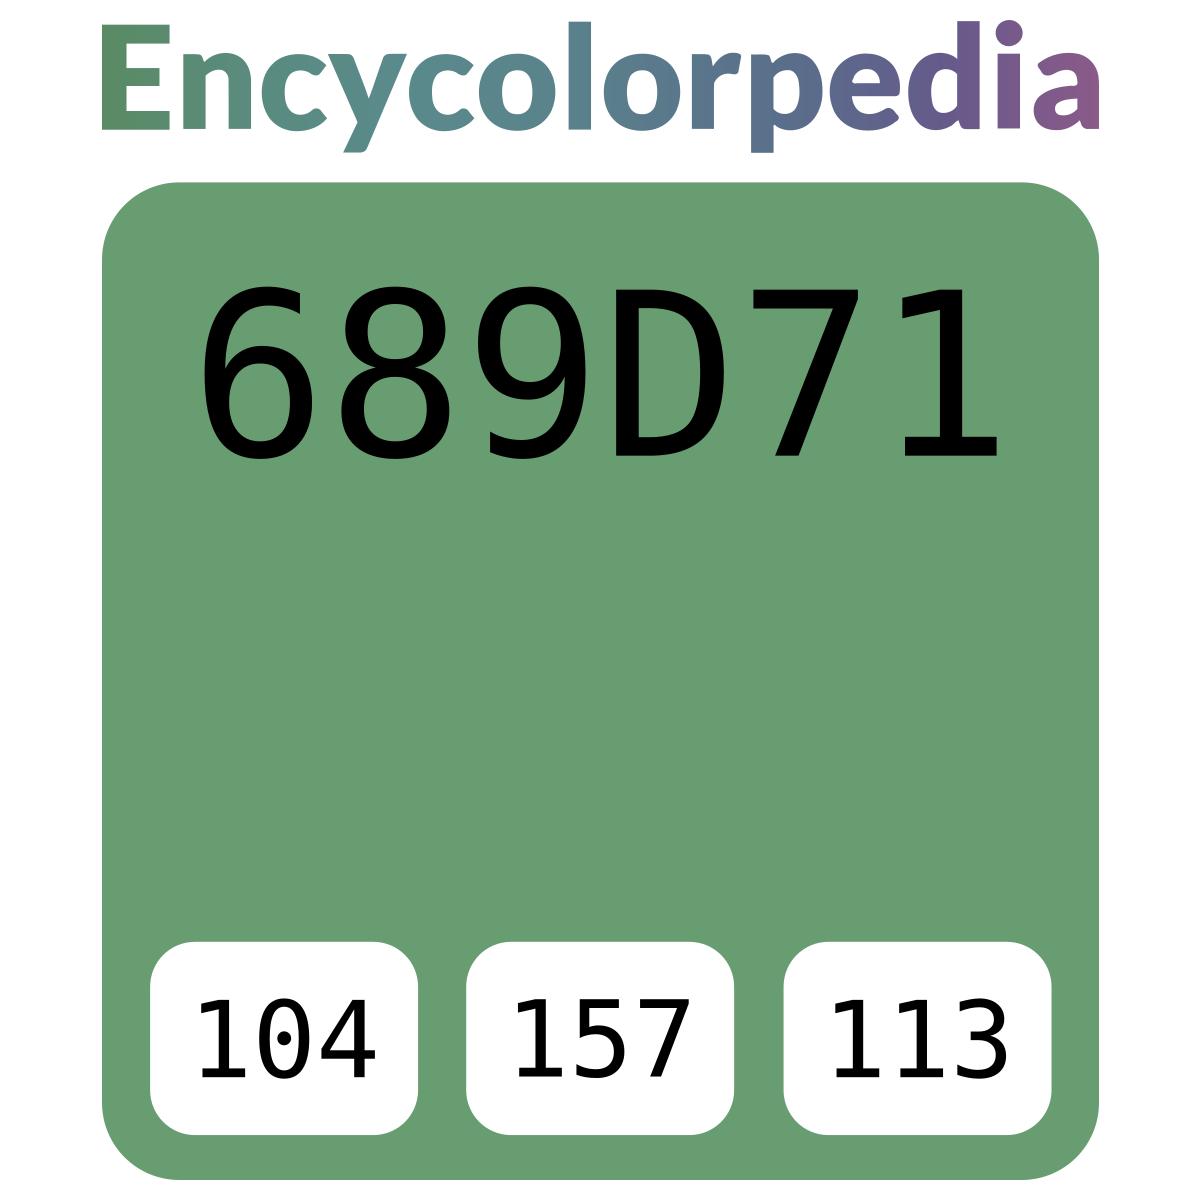 Code Couleur Vert Sauge vert sauge / #689d71 schémas de couleurs hexadécimal et